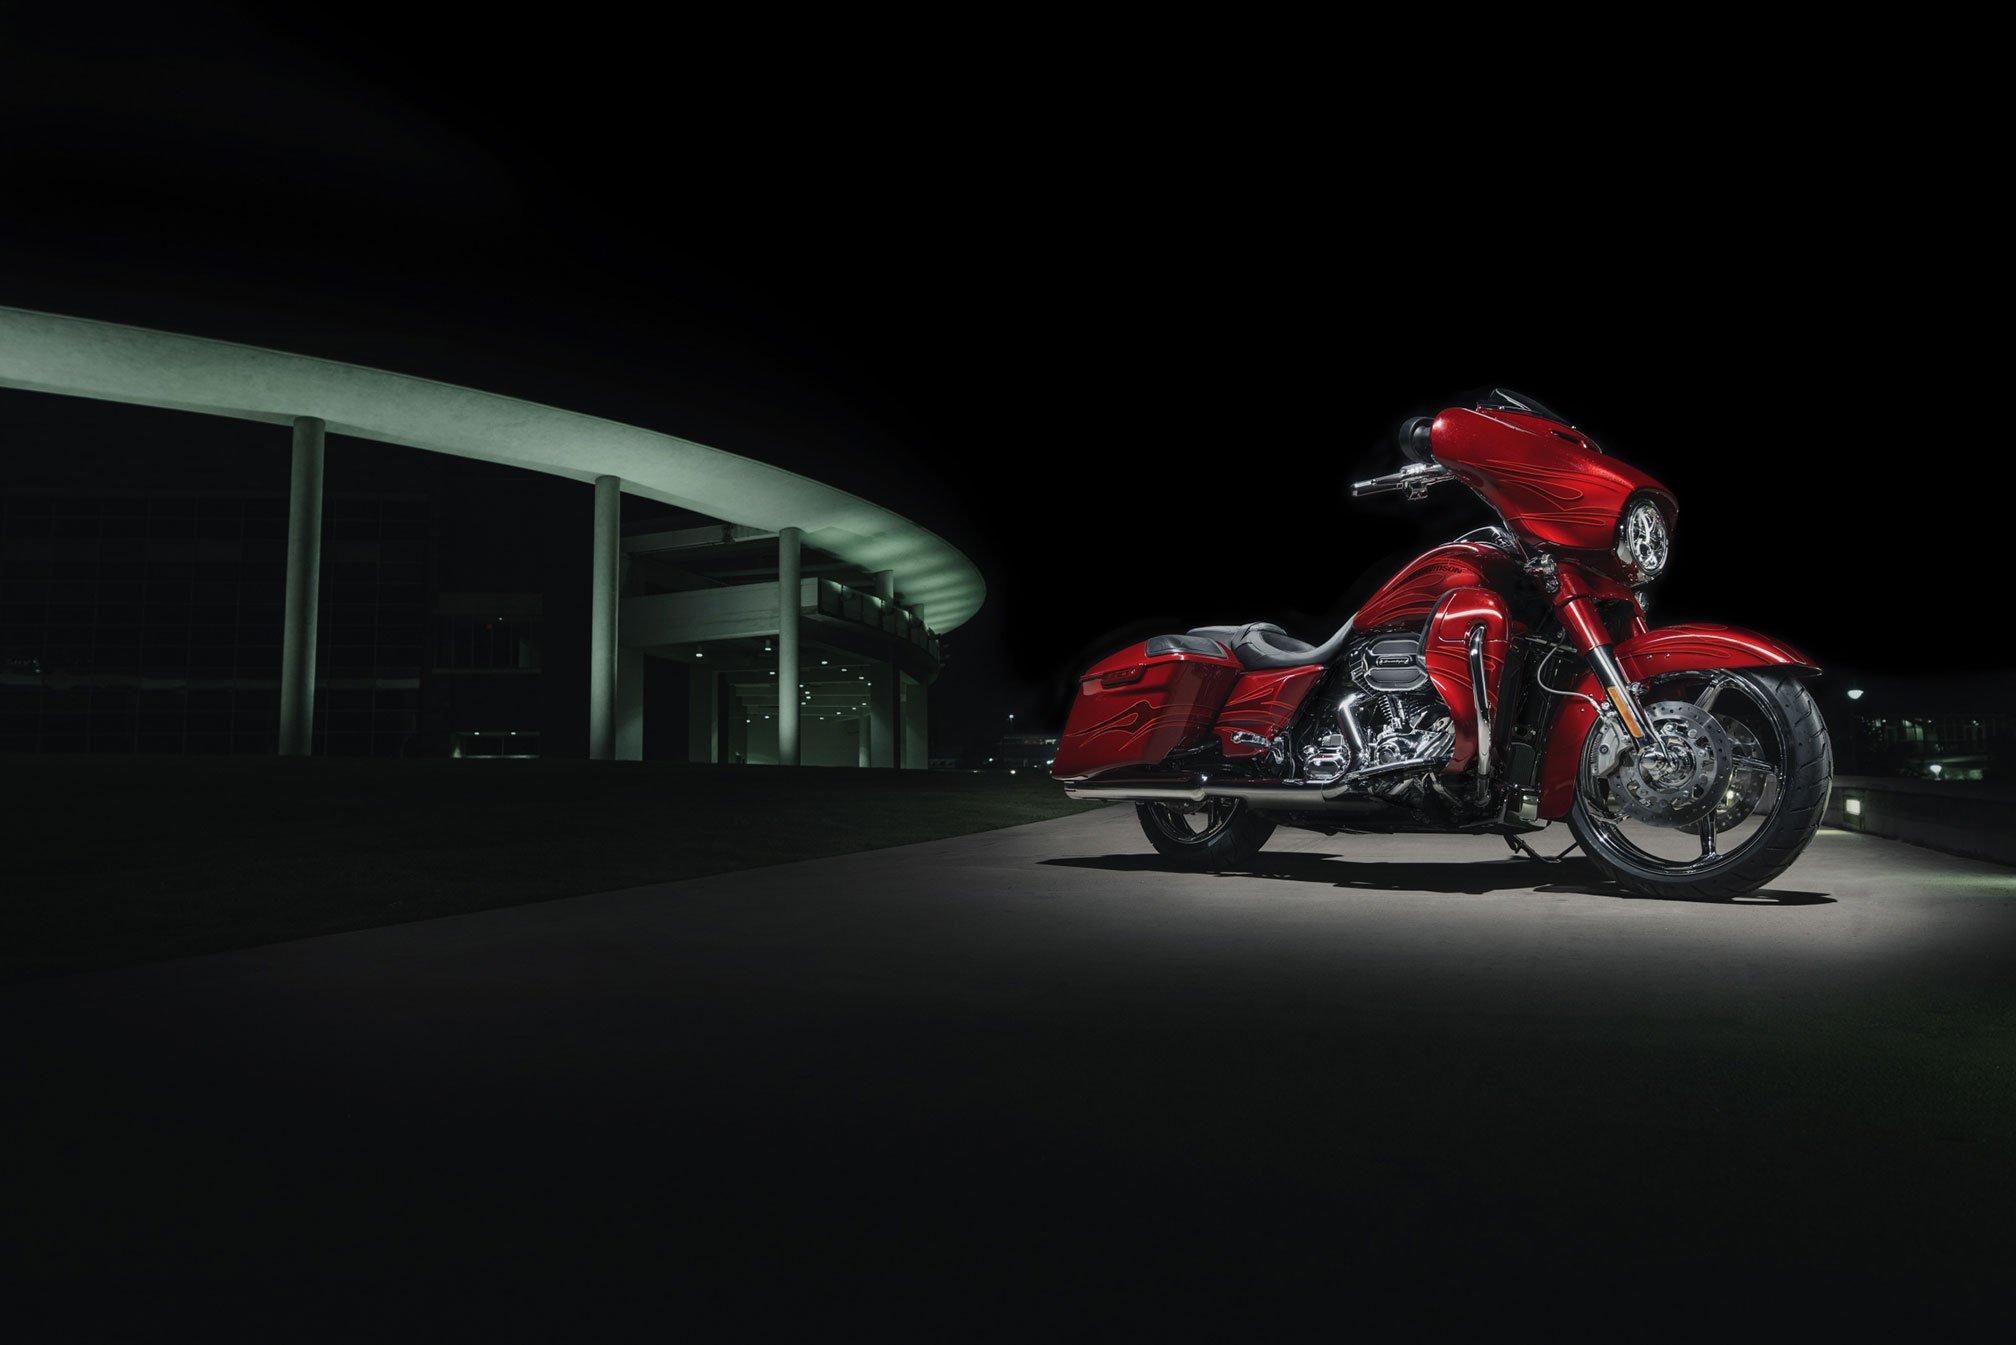 motorcycle harley street glide wallpaper - photo #2